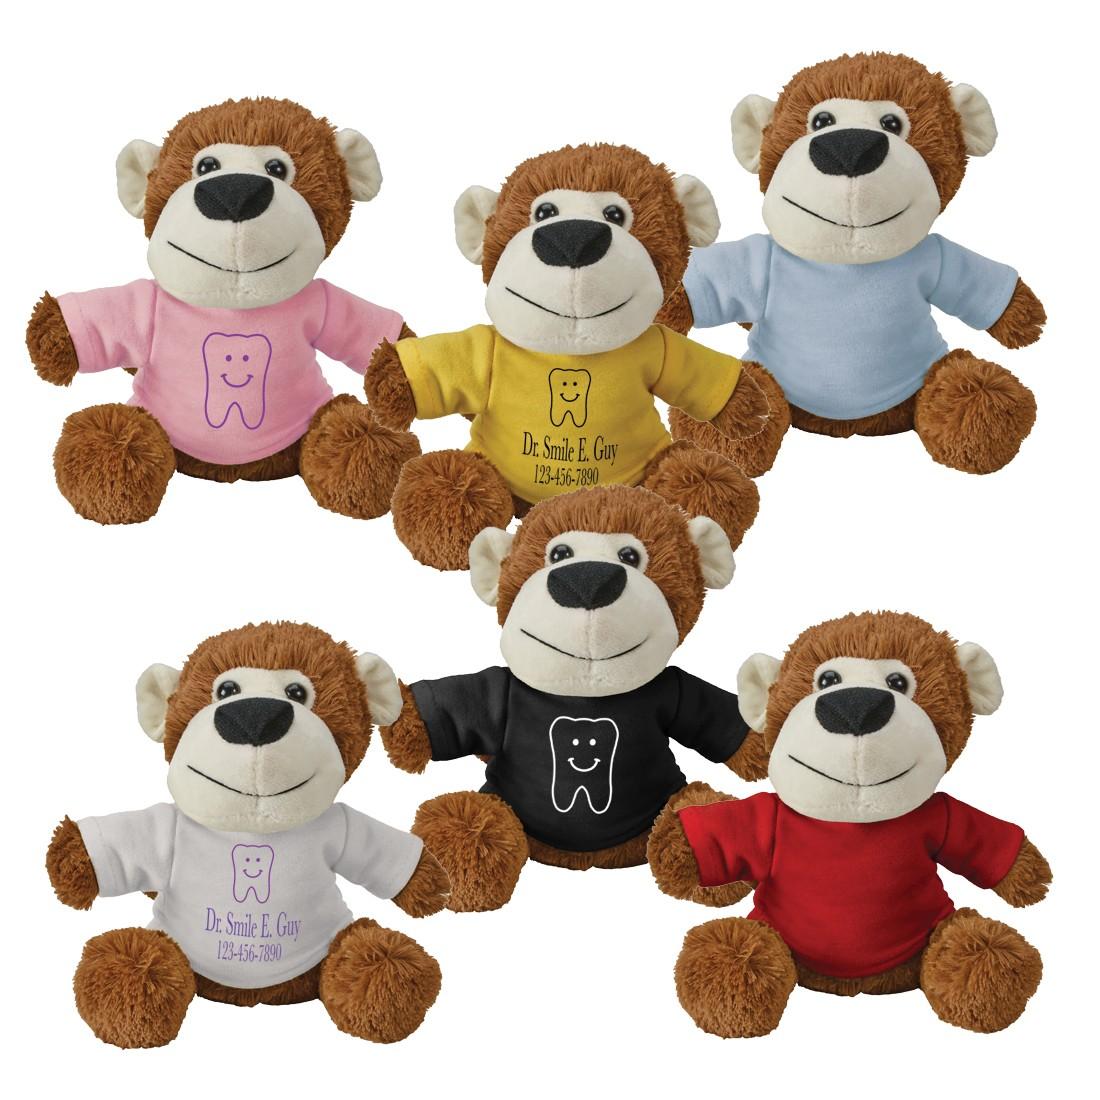 Custom Plush Fuzzy Friends Monkeys [image]